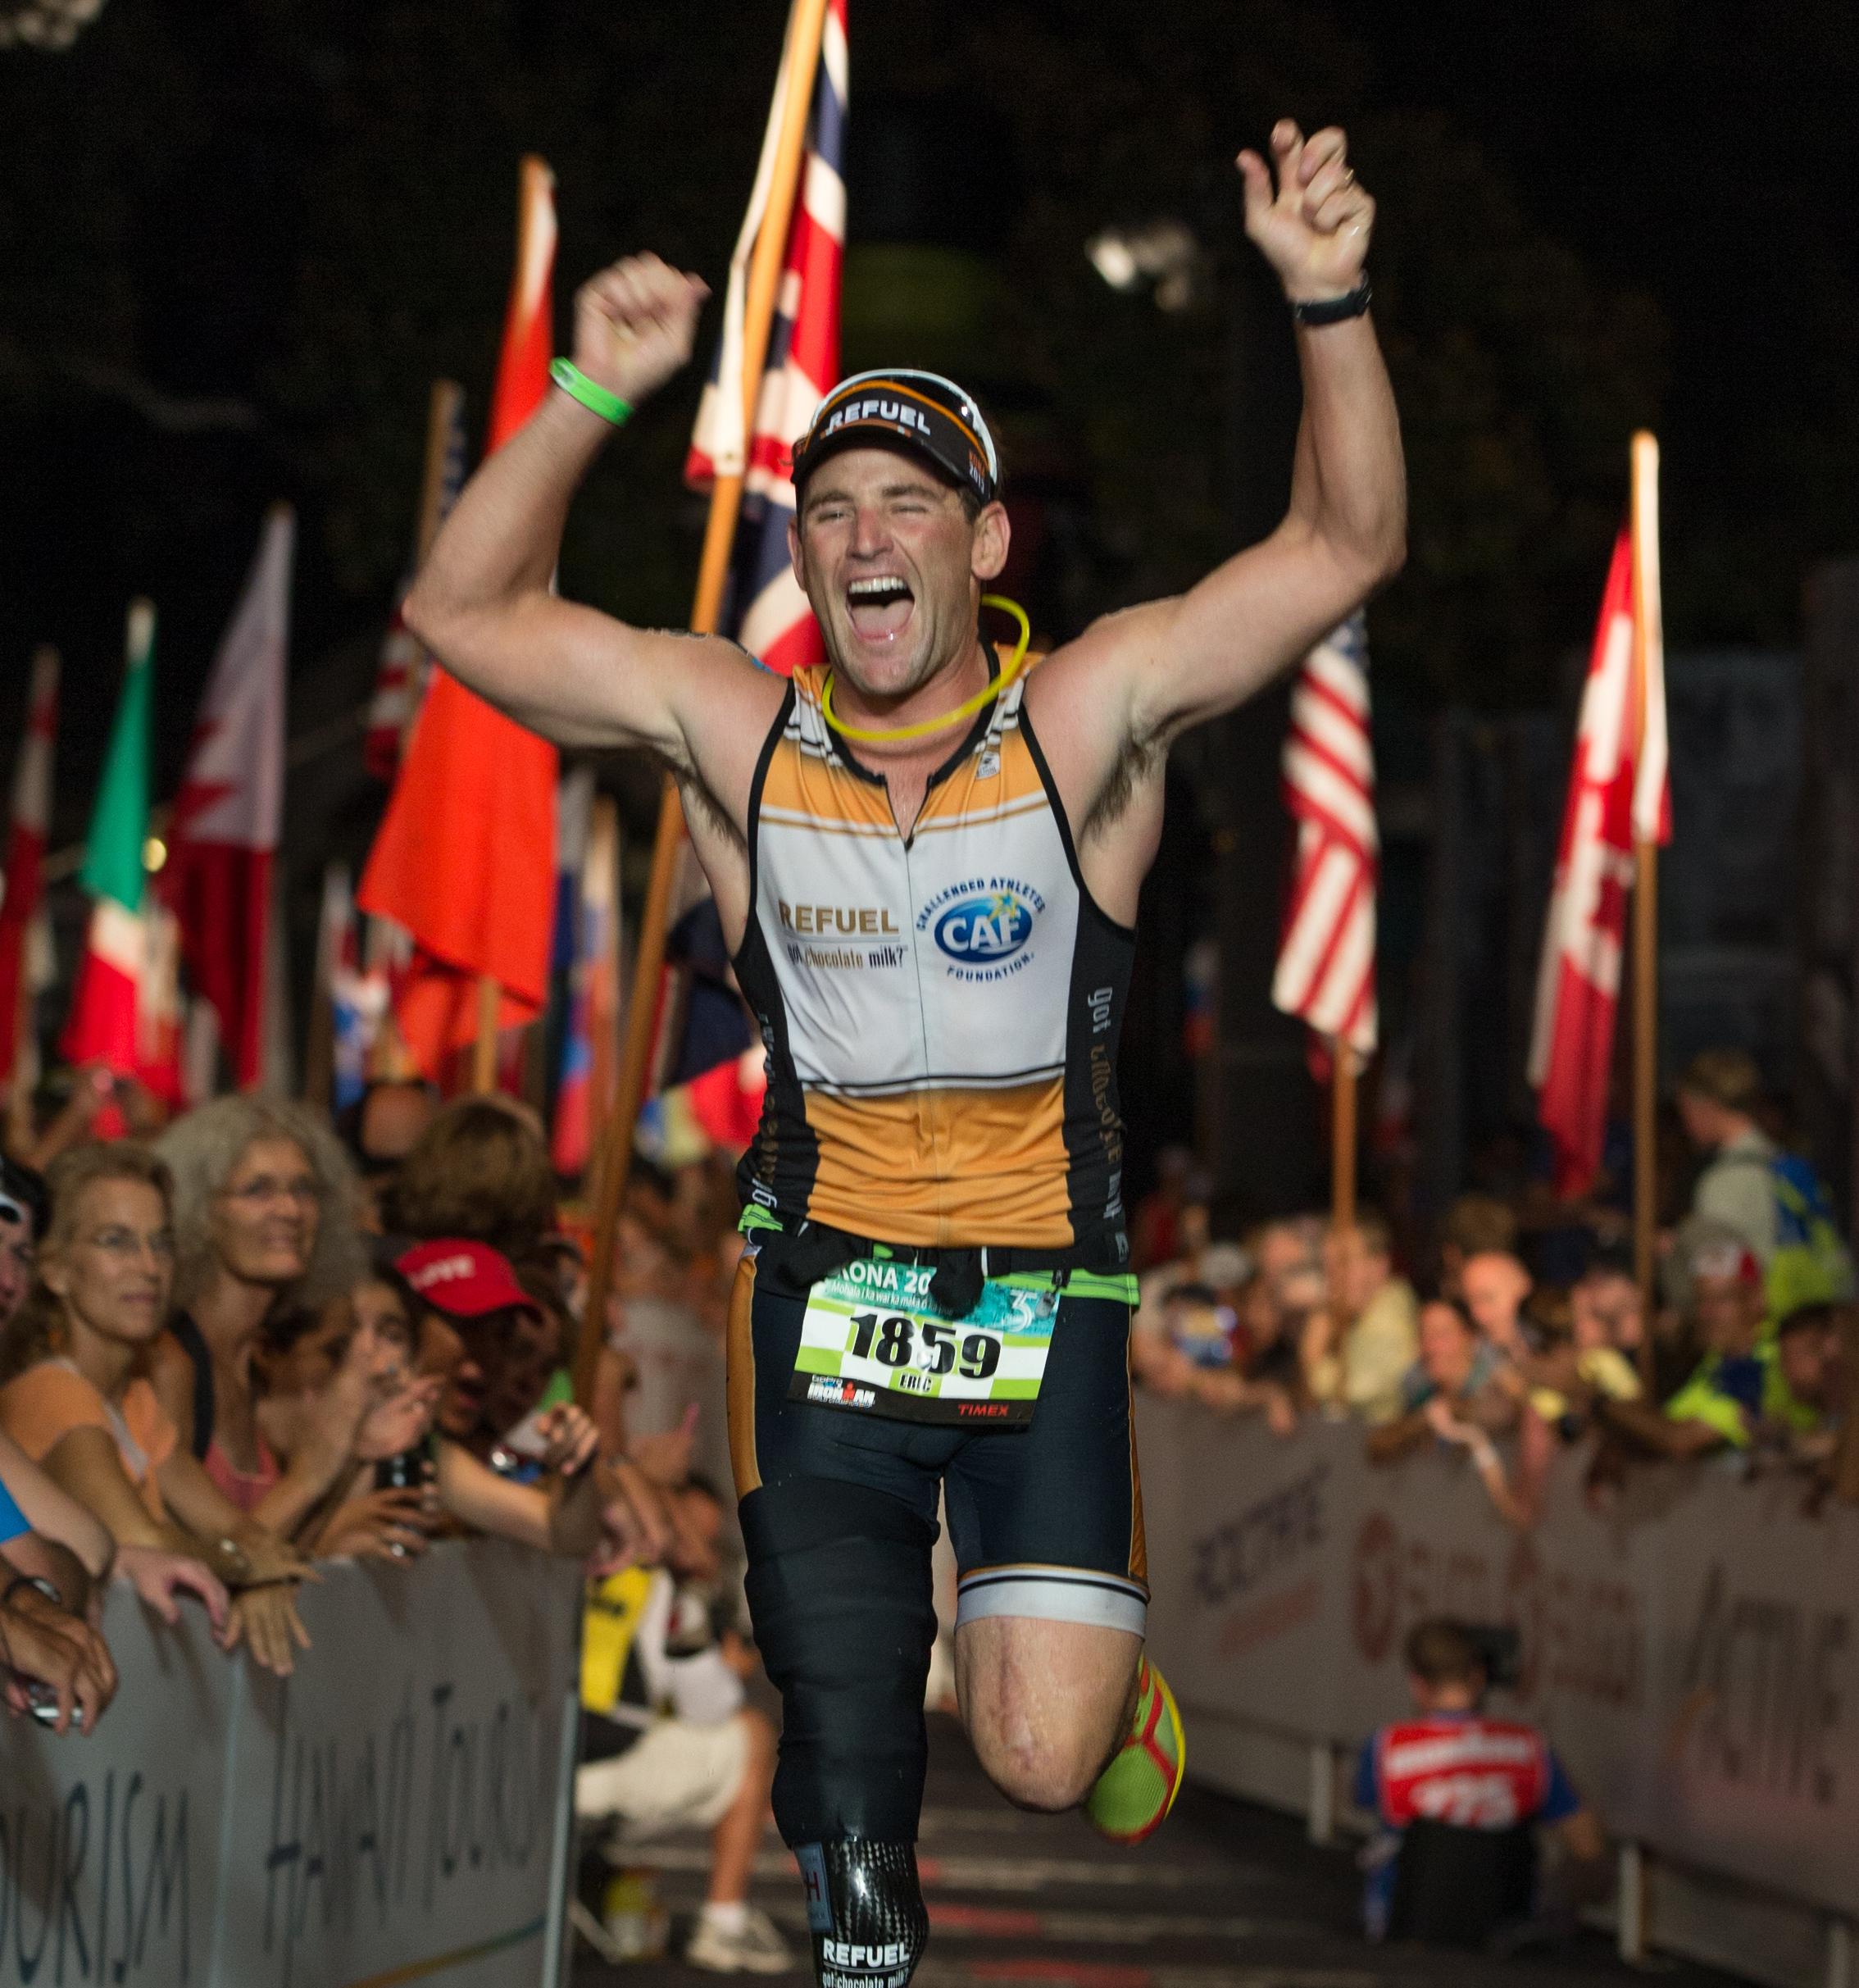 at the Ironman World Championship in Kailua-Kona, Hawaii on October 12, 2013